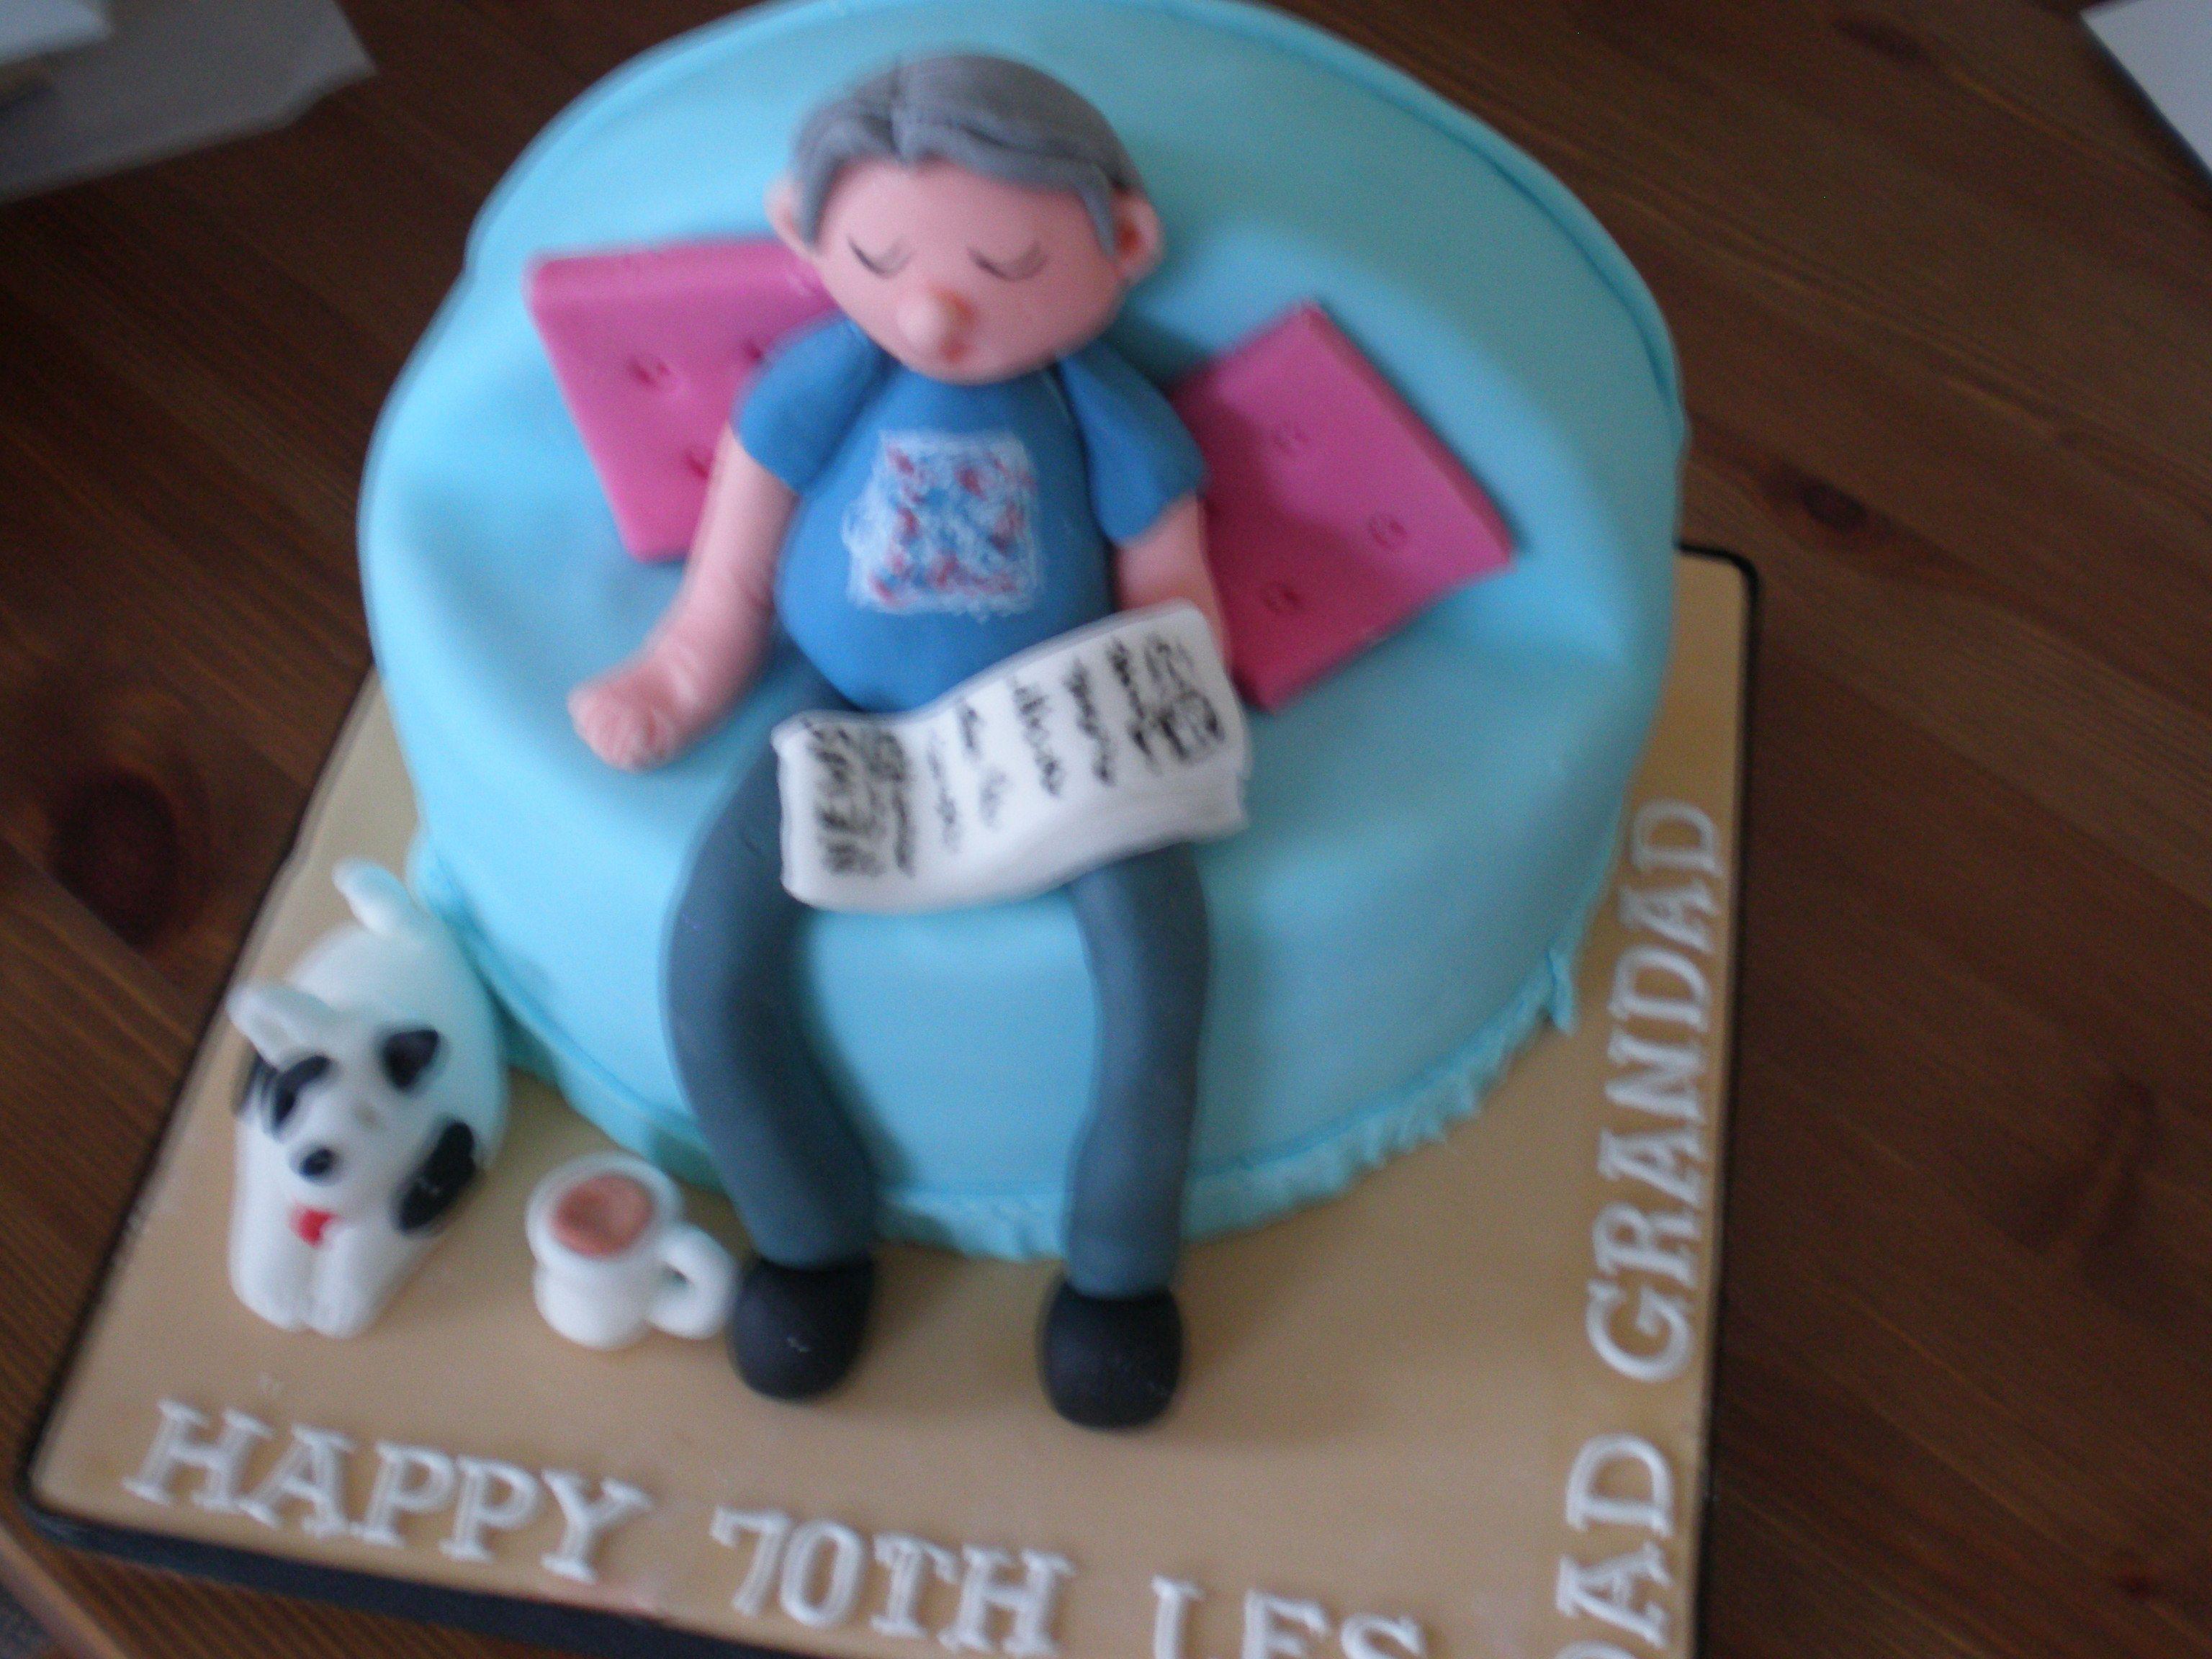 Just chilling 70th Birthday Cake wwwkitchenfairiesleedscouk